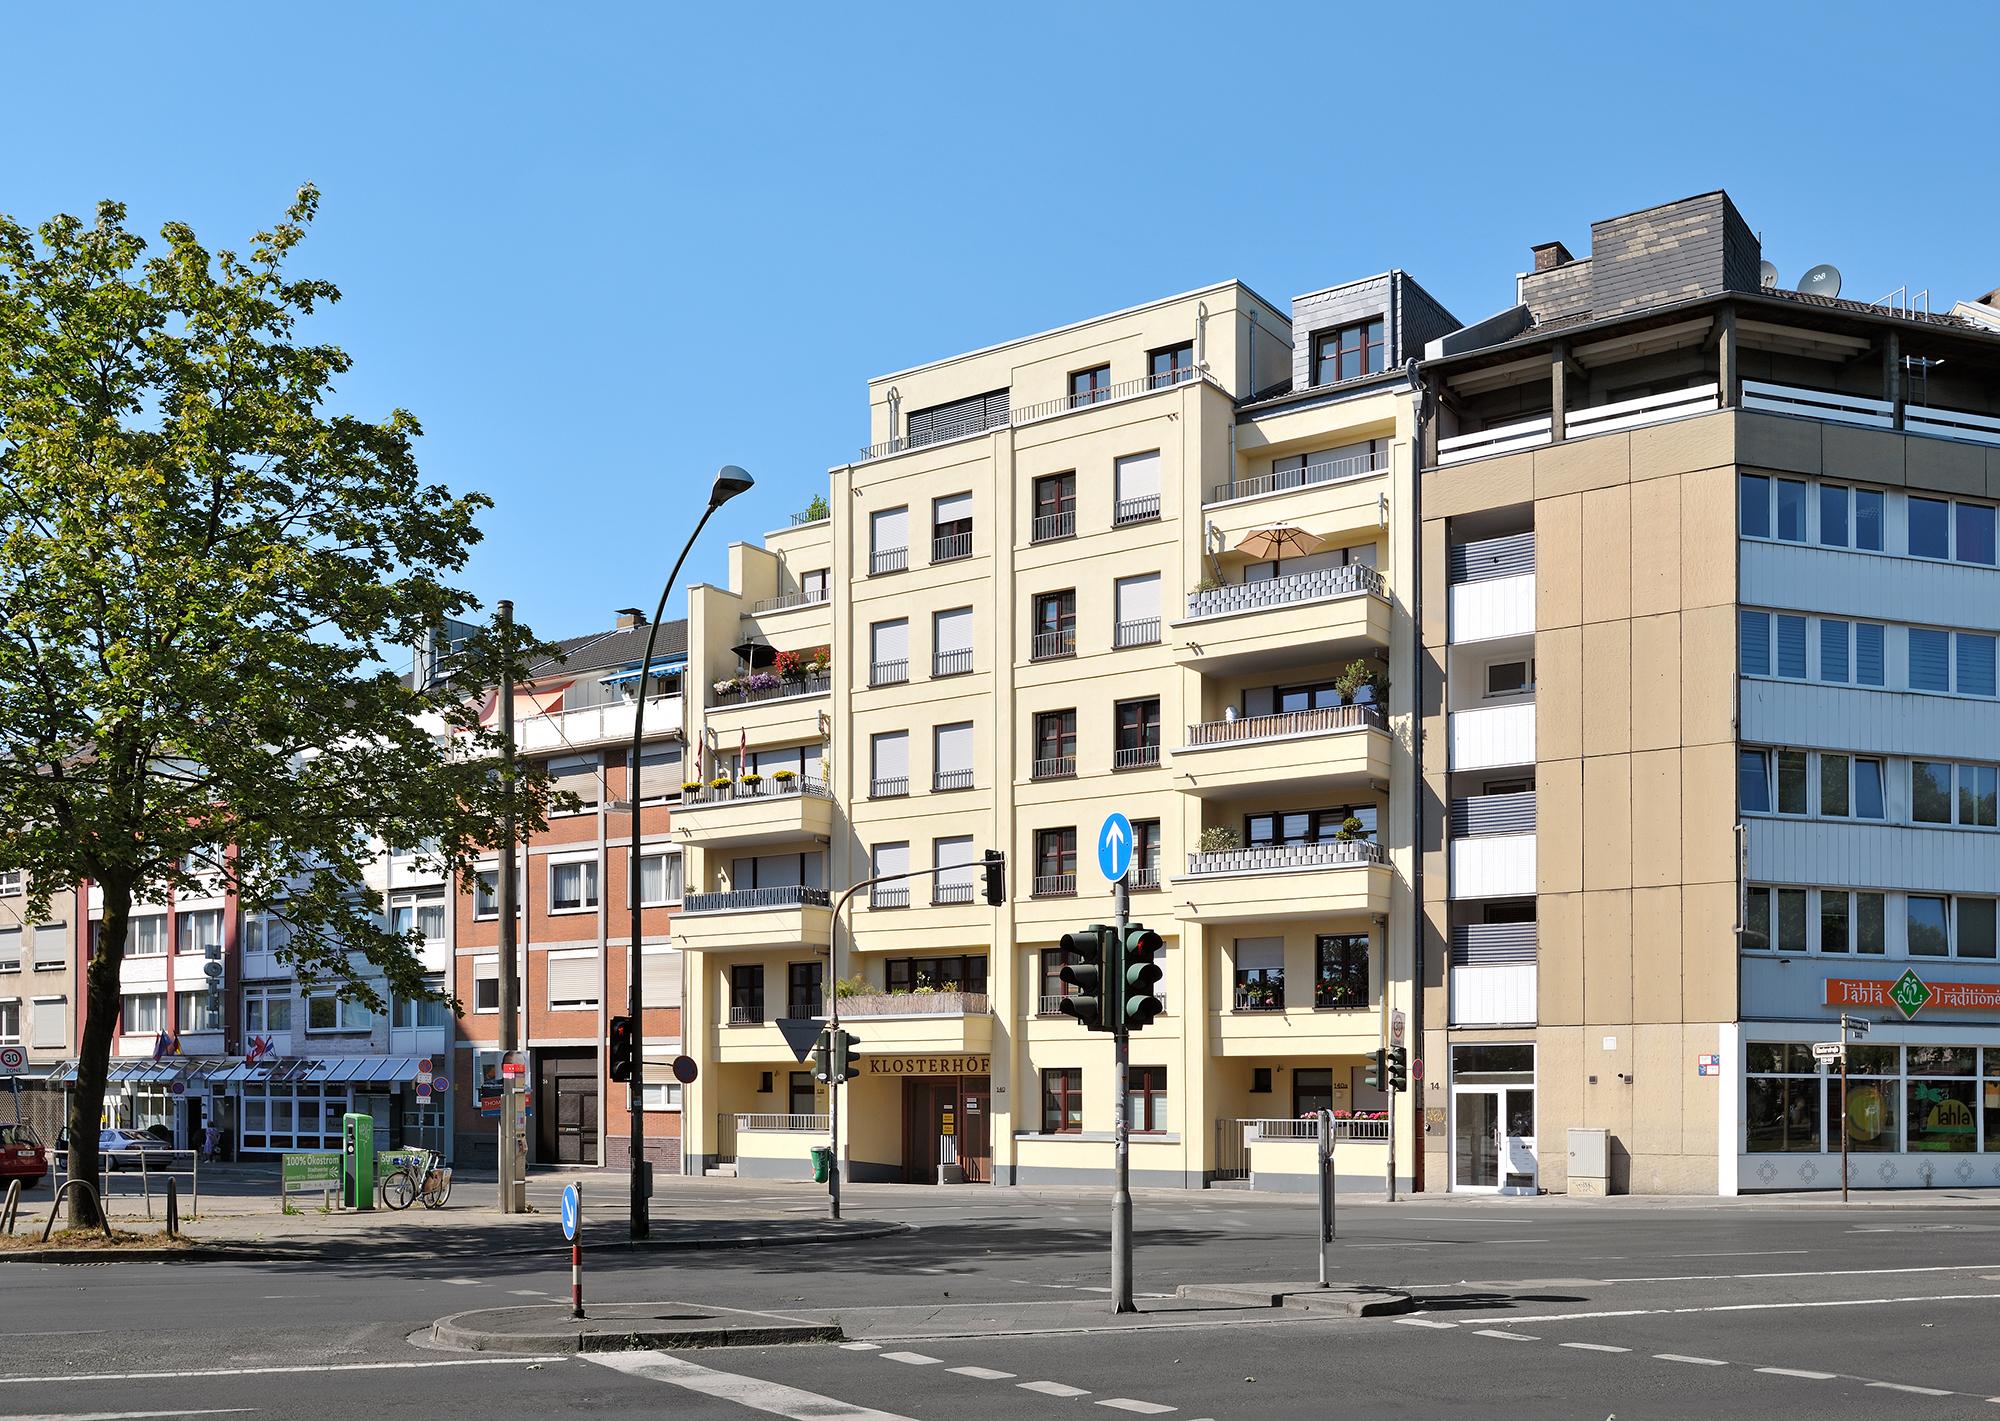 heckundschmiegel-projekte-klosterstrasse-1